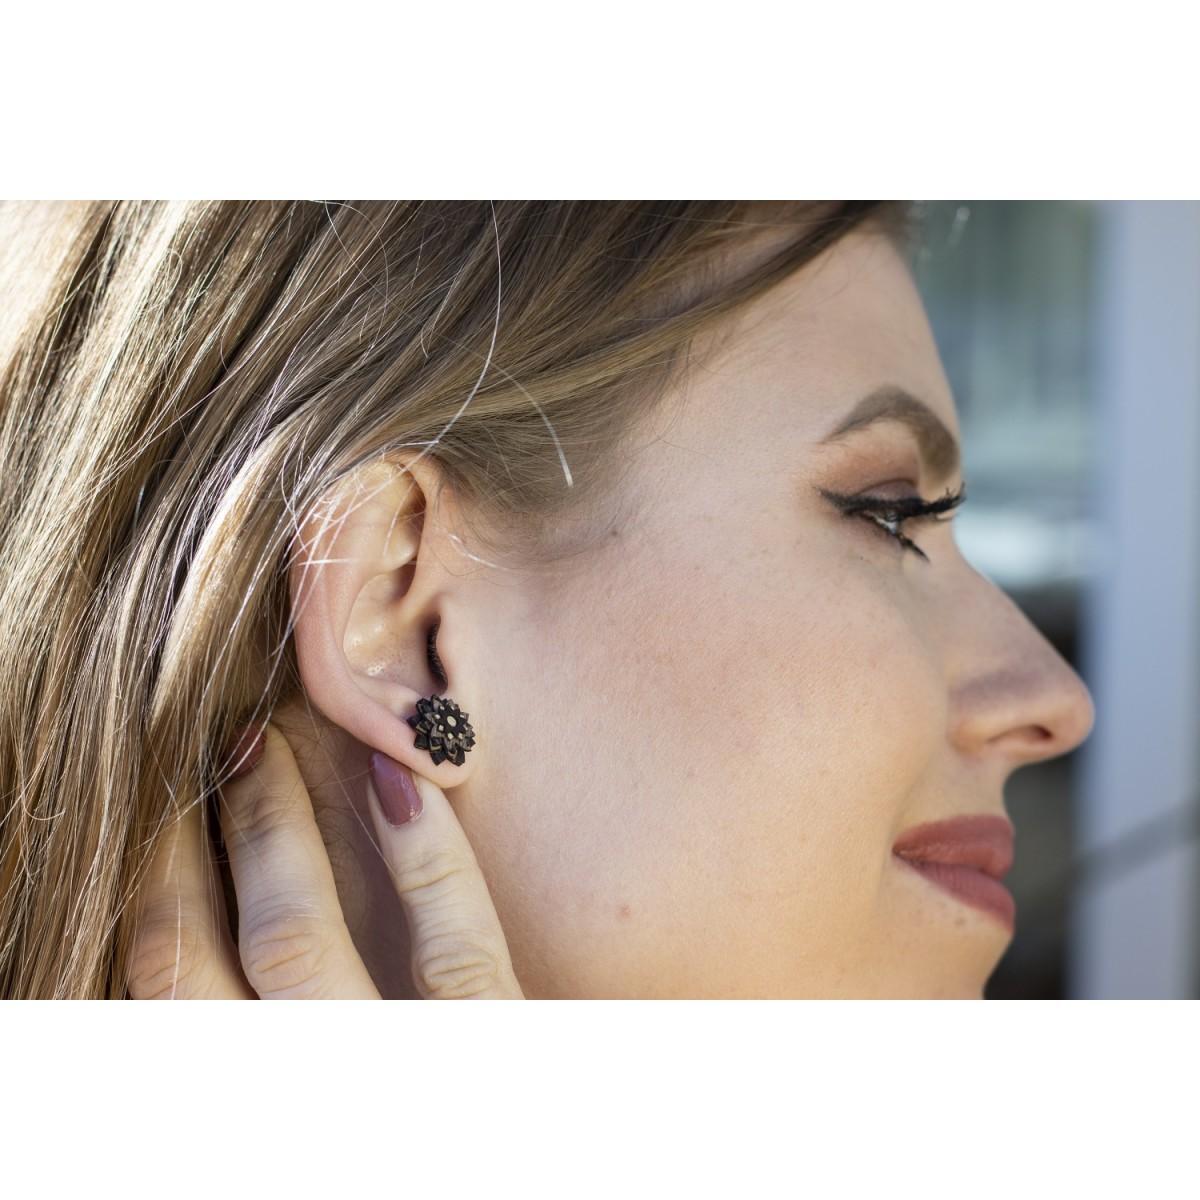 BeWooden Ohrringe - Ohrstecke mit Holzdetail - Motiv Blume - African Flower Earrings